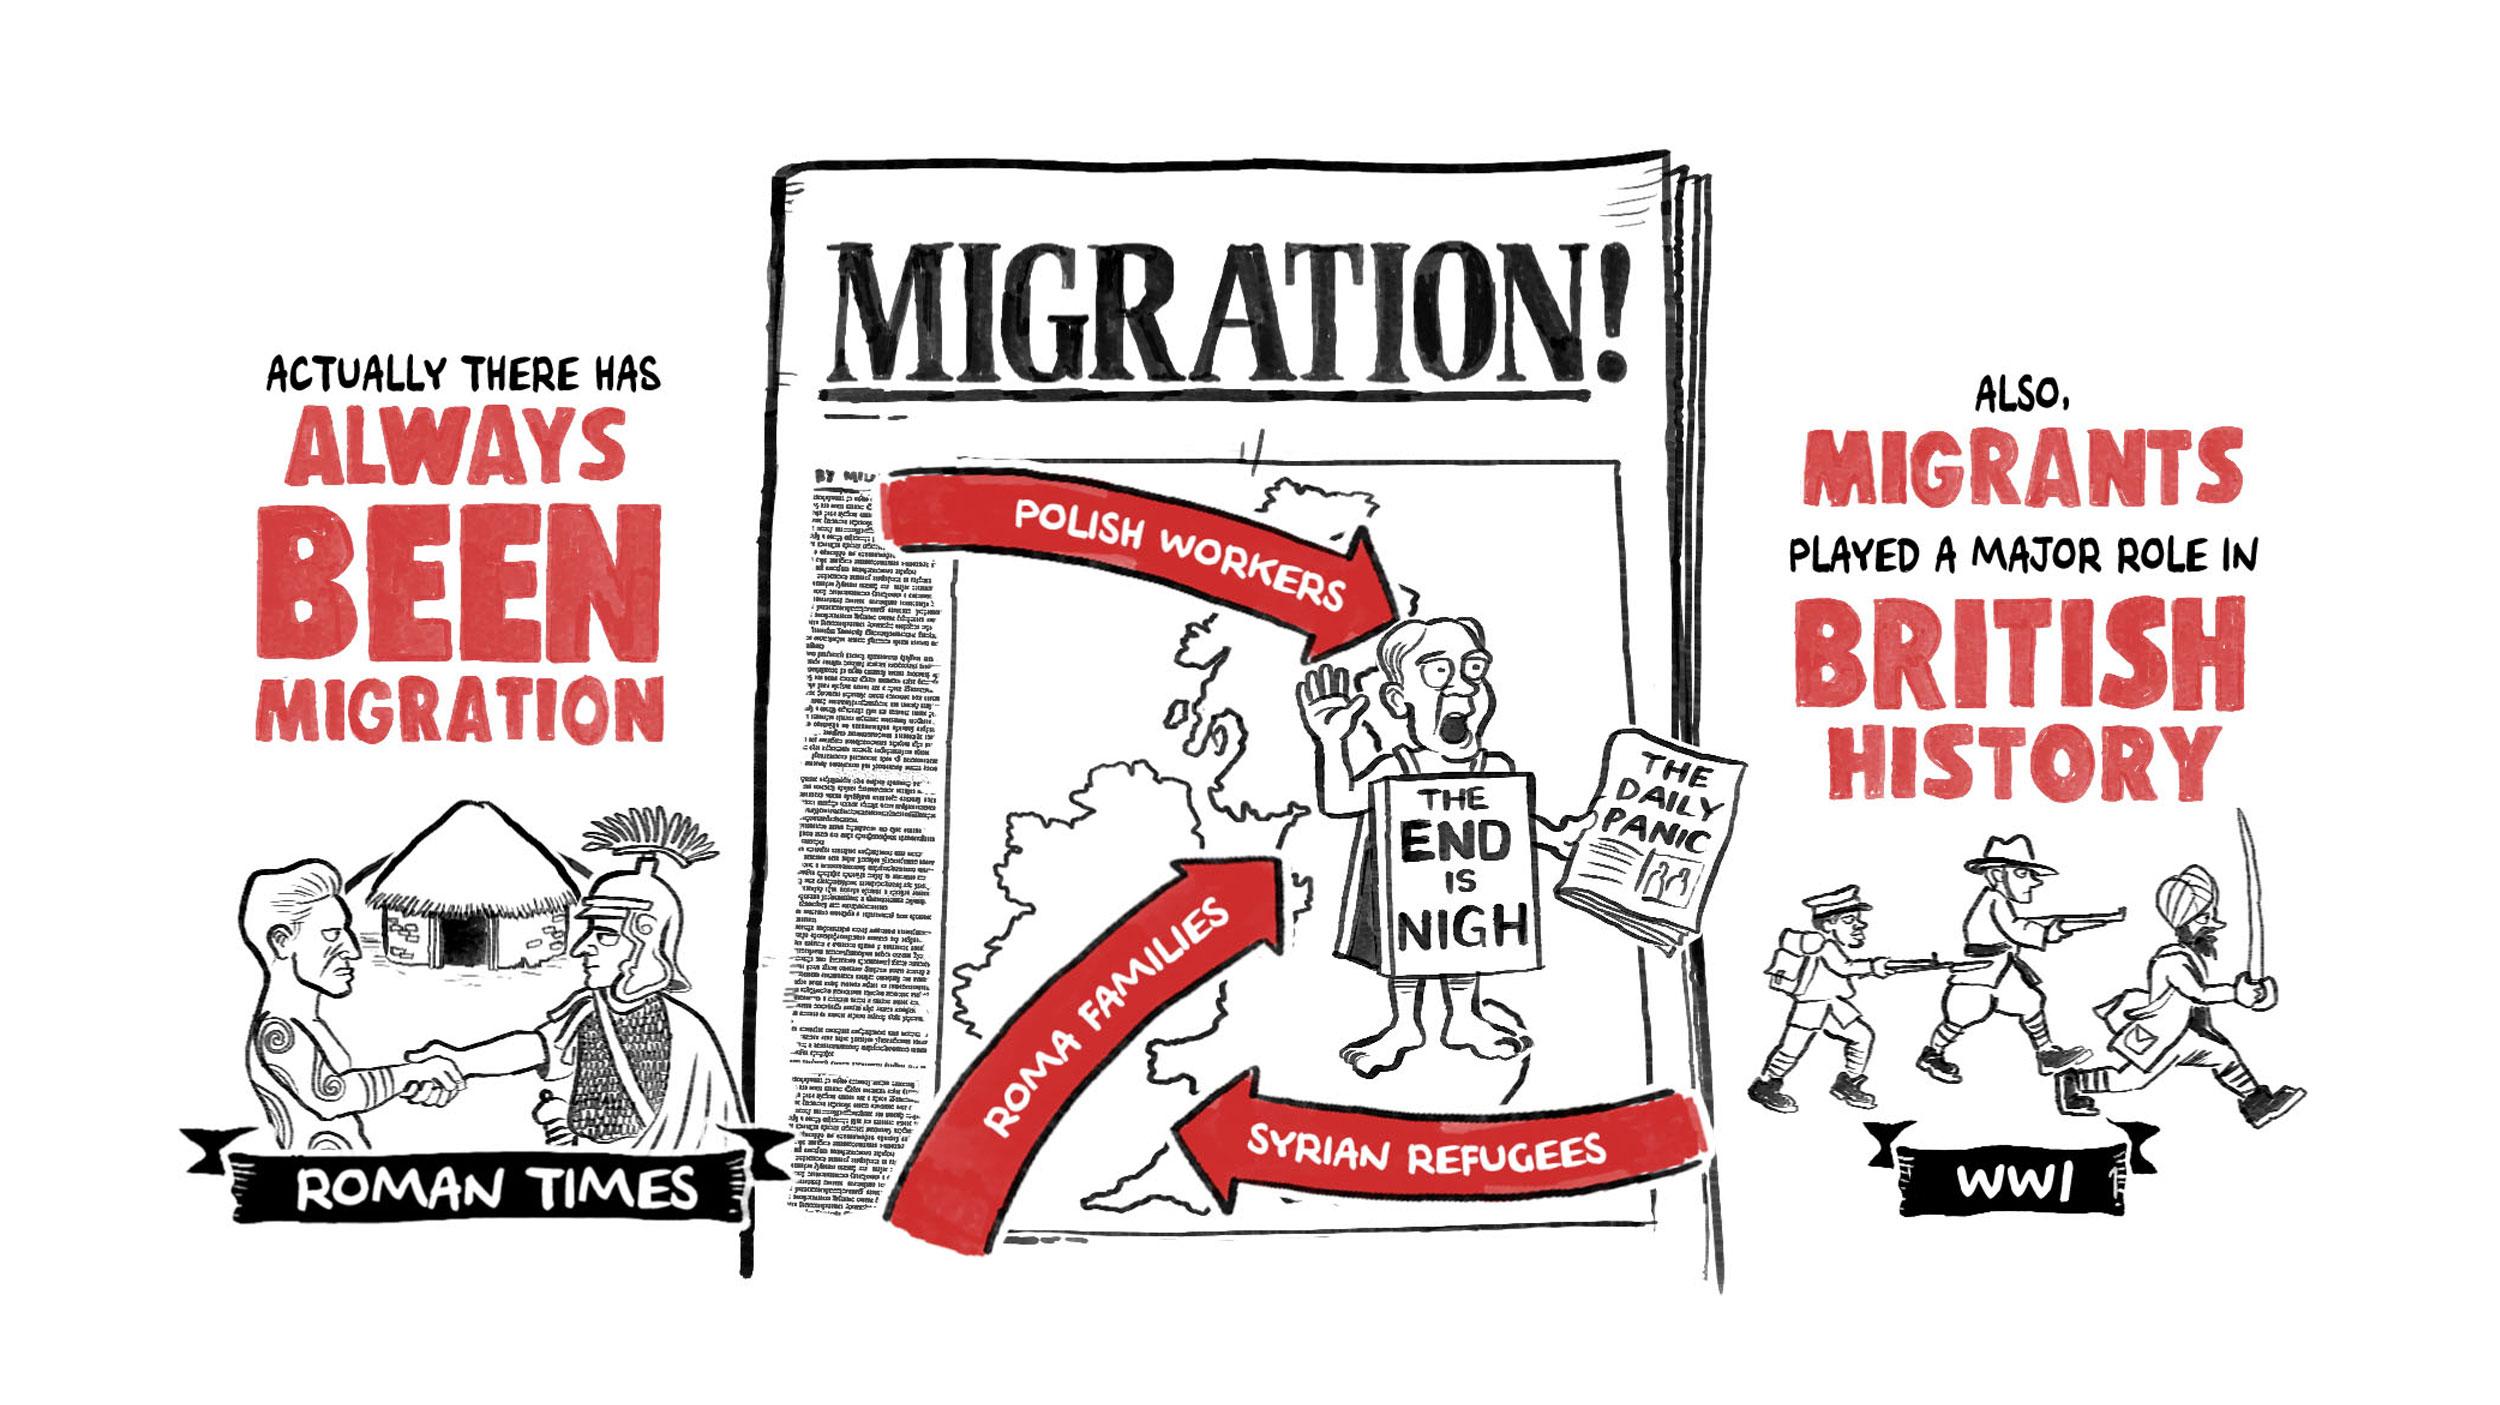 univeristy-of-kent-and-reading-migration-cognitive-04.jpg